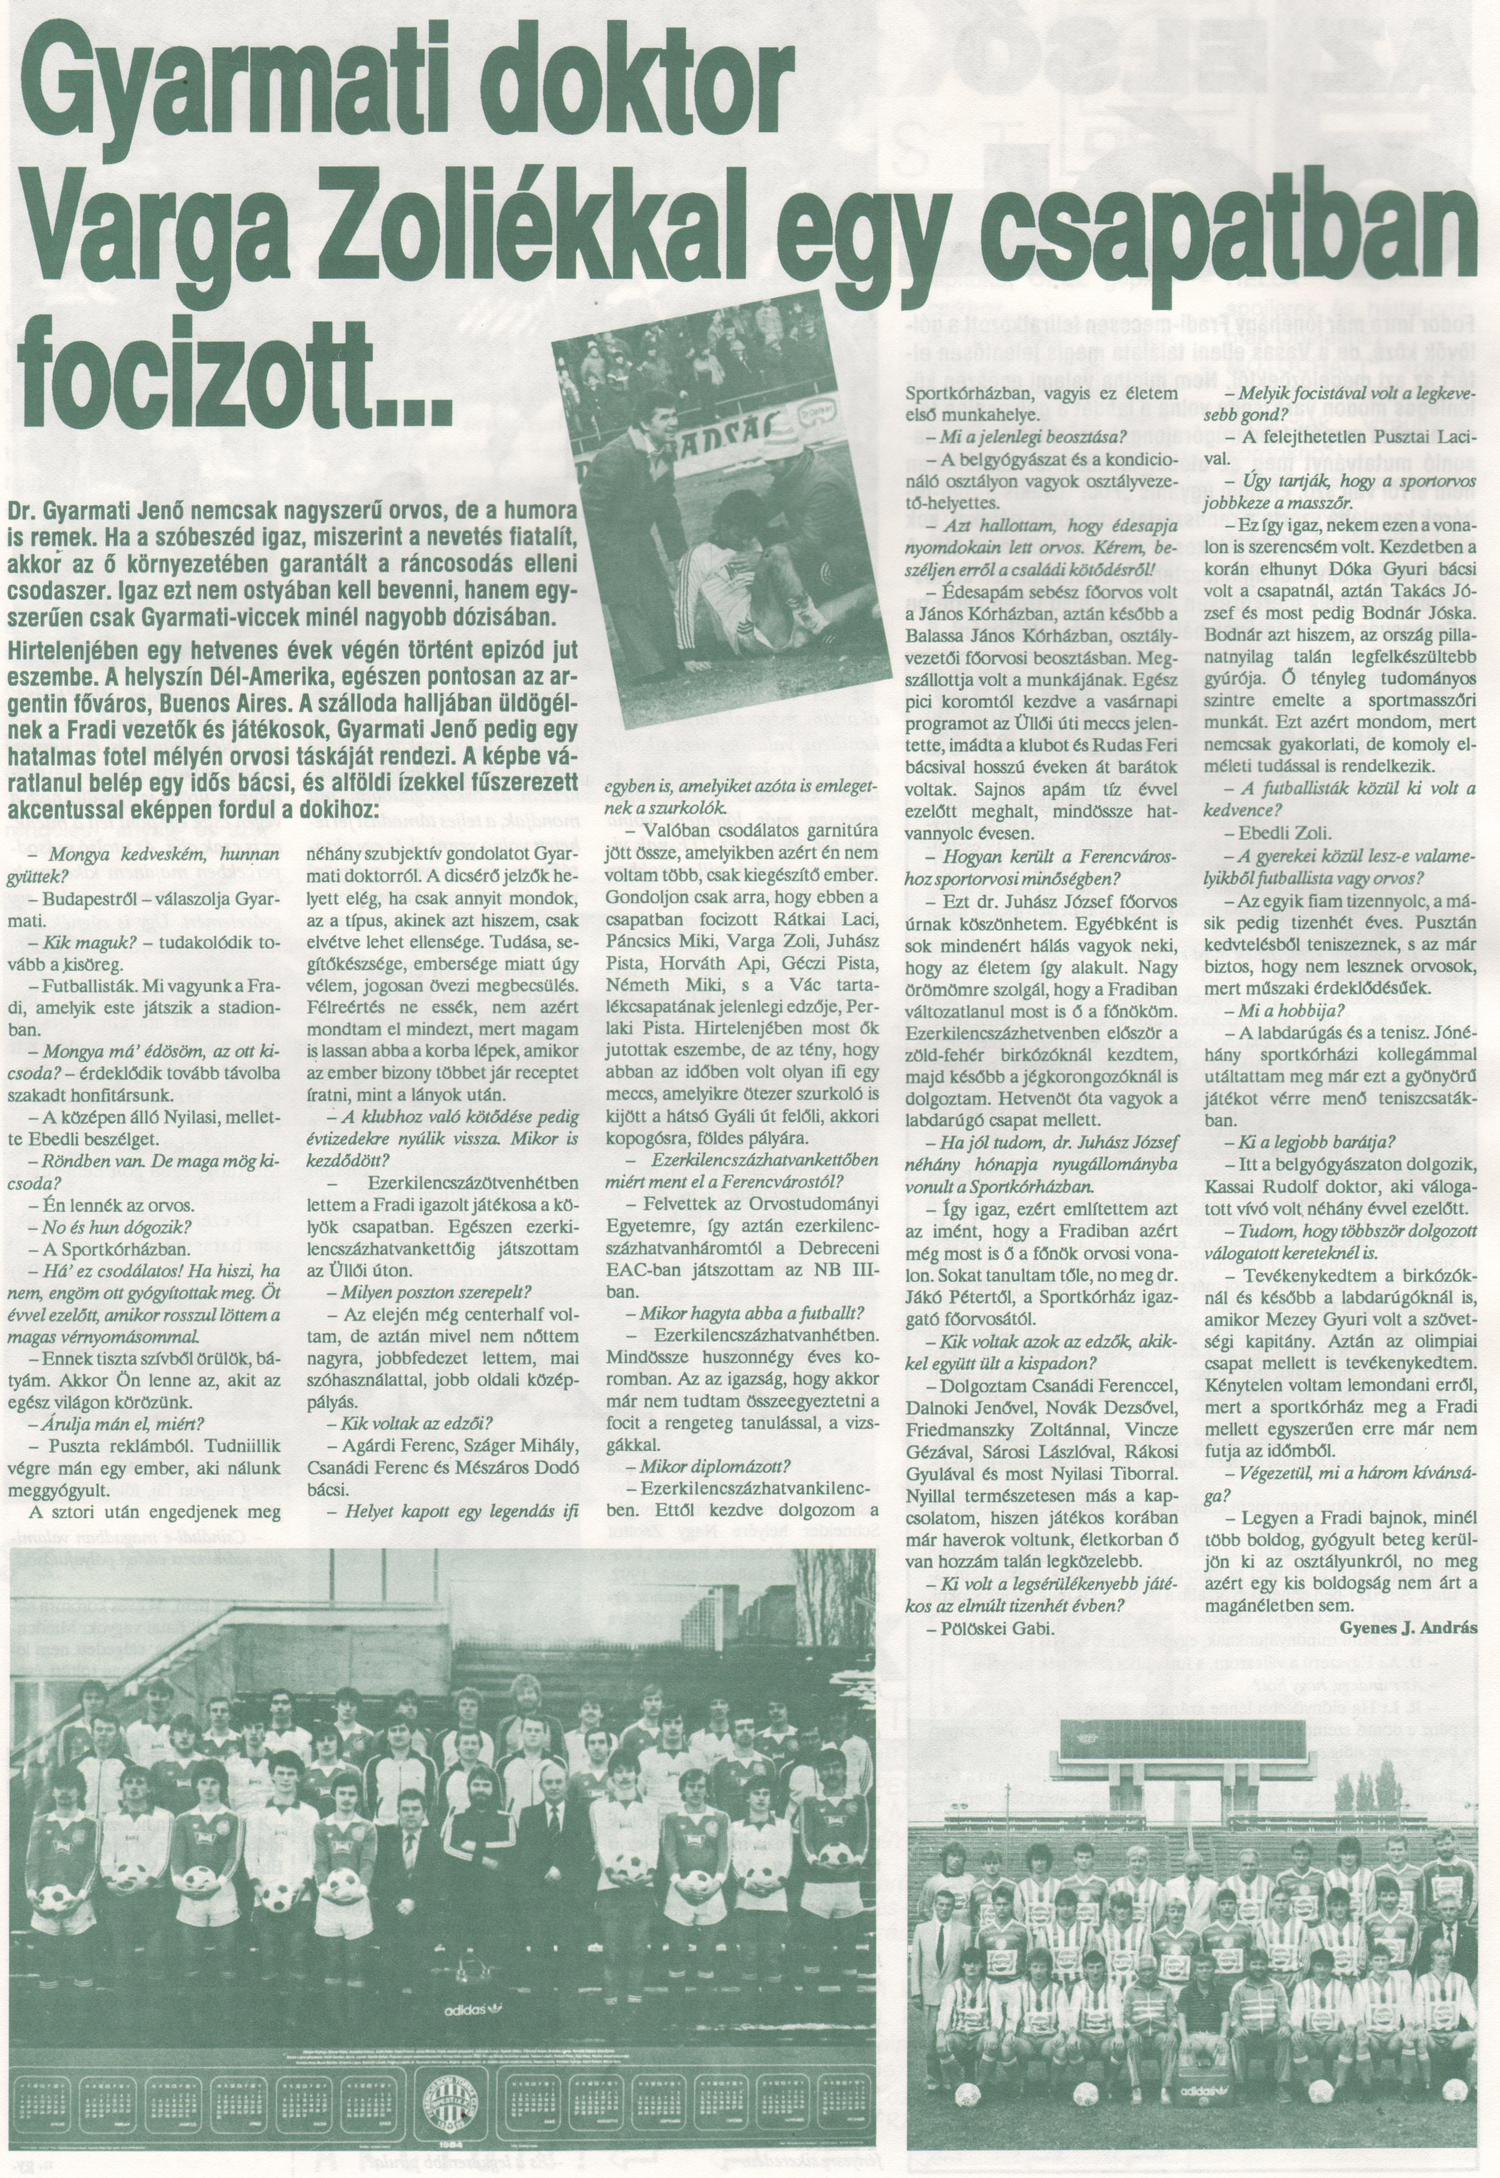 TFU_19920325_FU-Zs_004 -0004